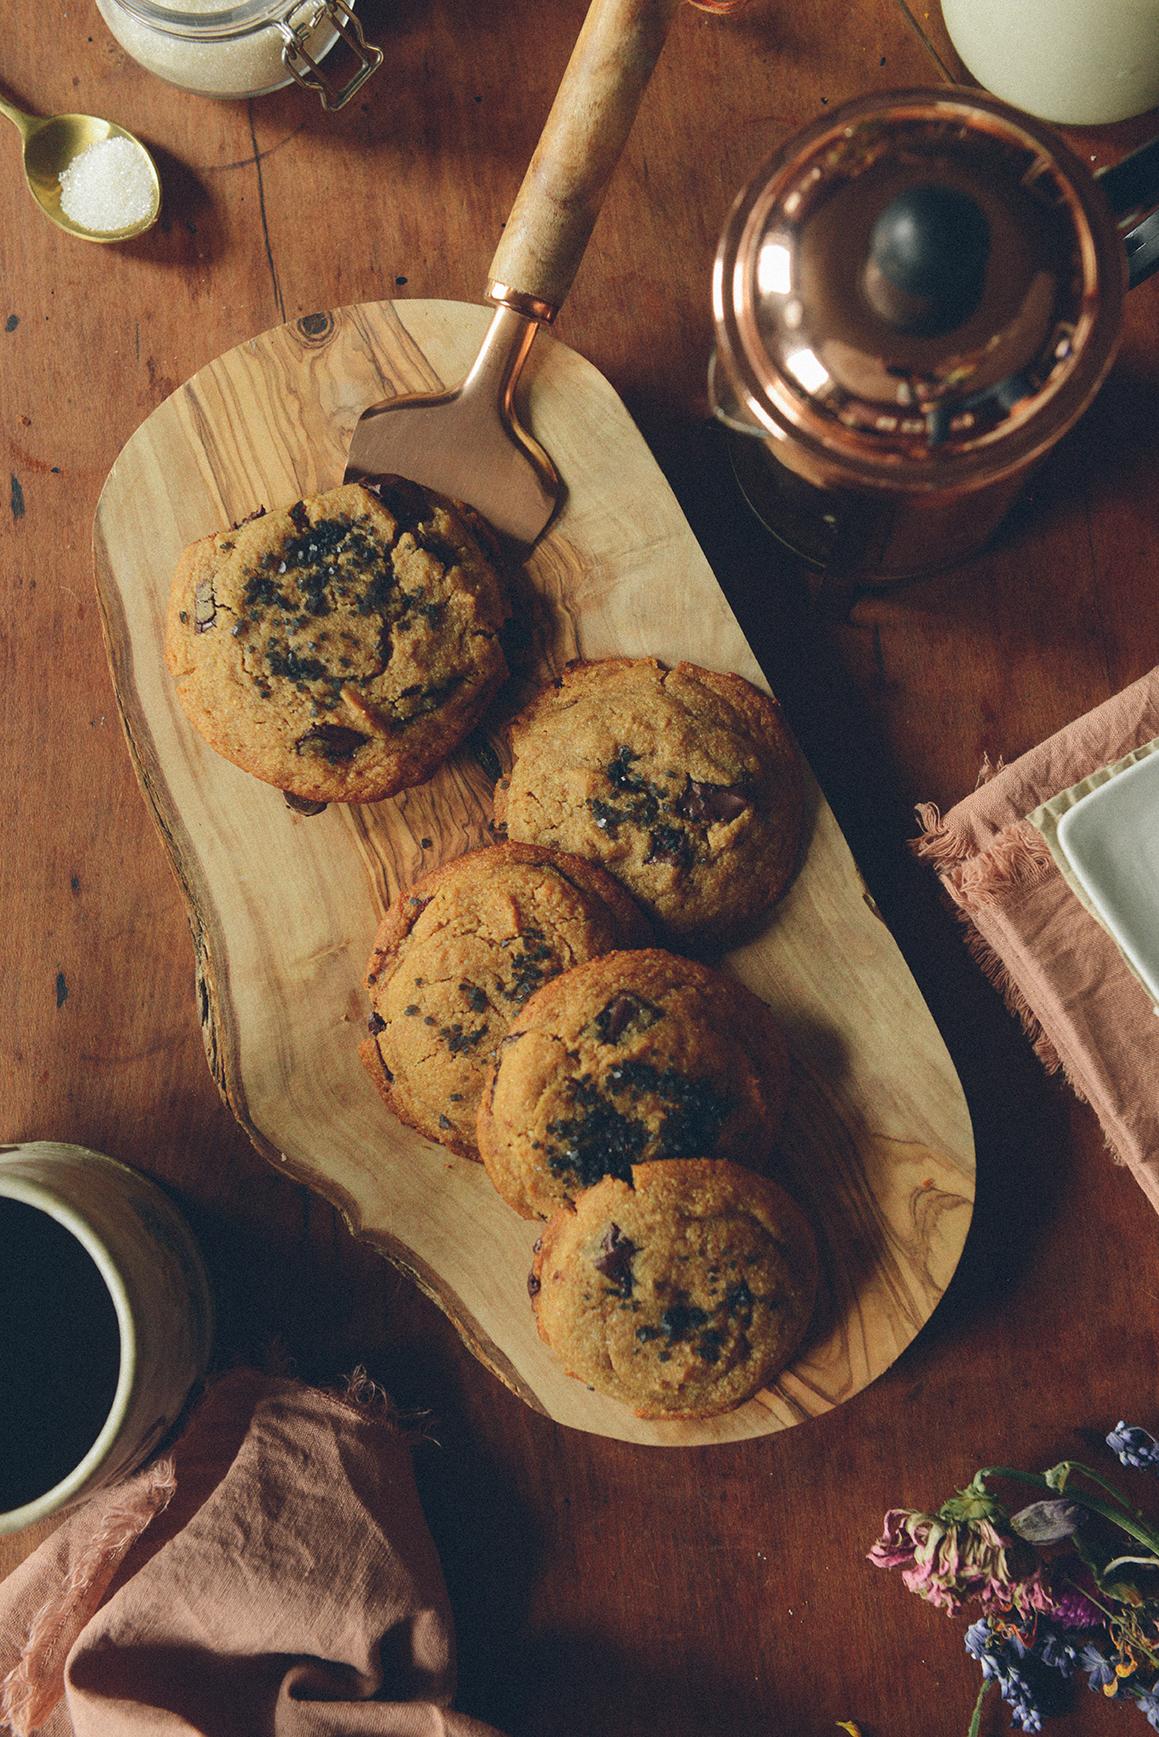 Gluten-Free Peanut Butter Chocolate Chunk Cookies